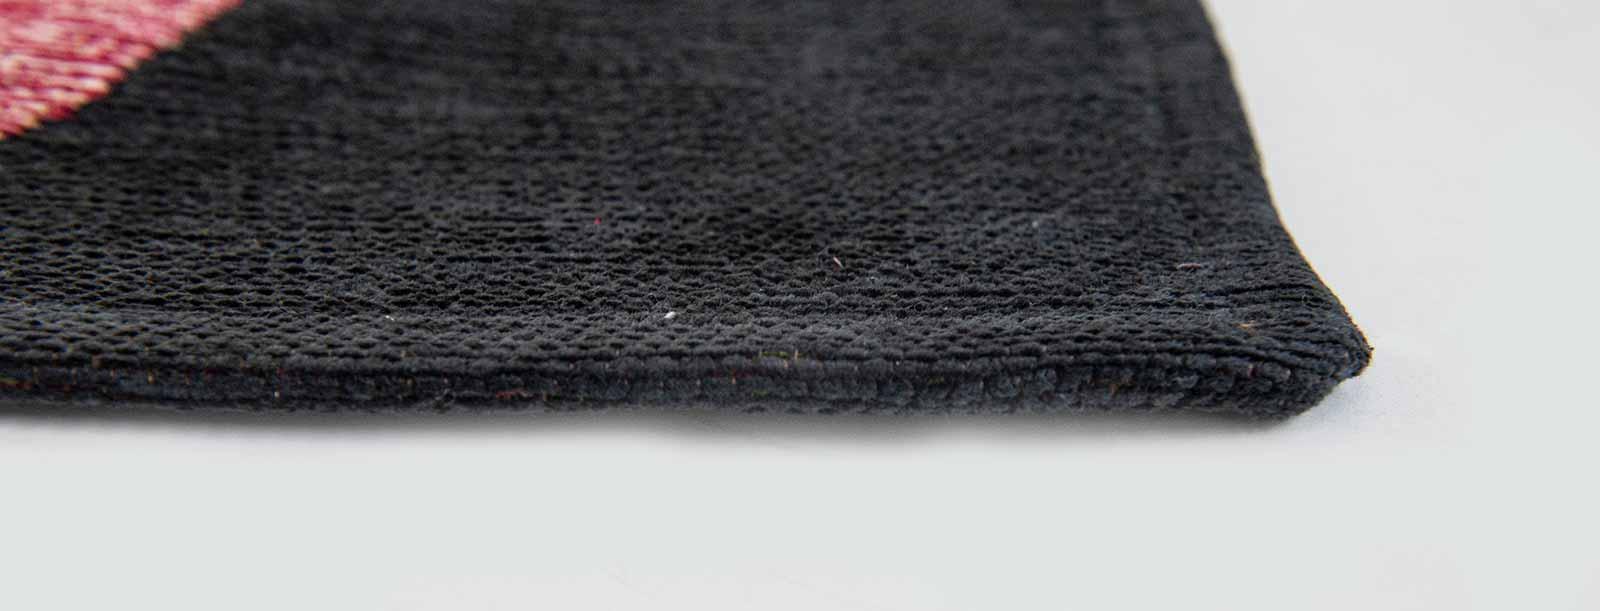 Louis De Poortere tapijt Fischbacher 9051 Interfloral Multi side